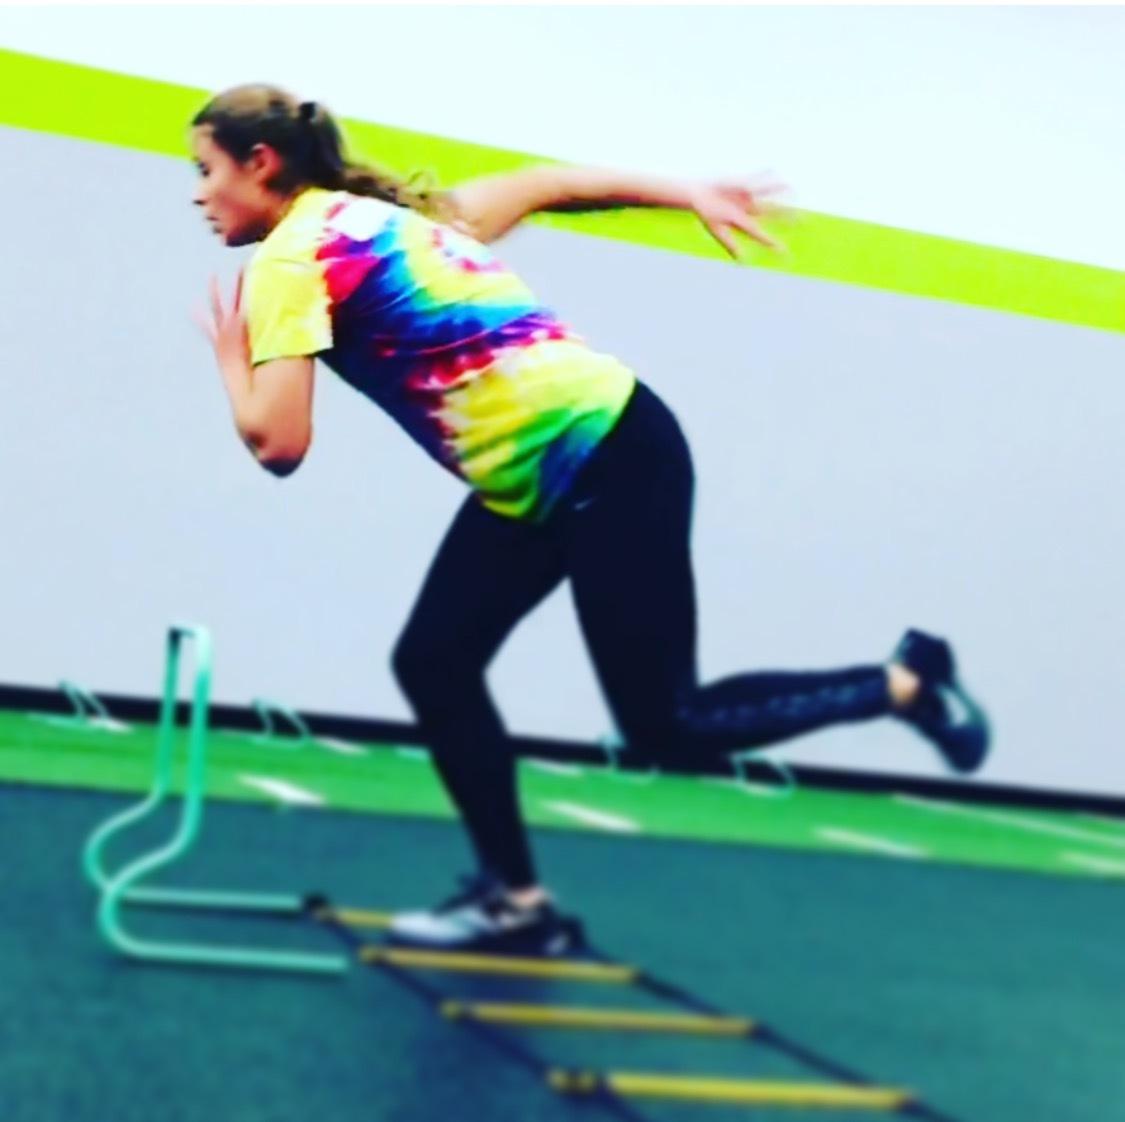 Erin-Hurdle-Jump